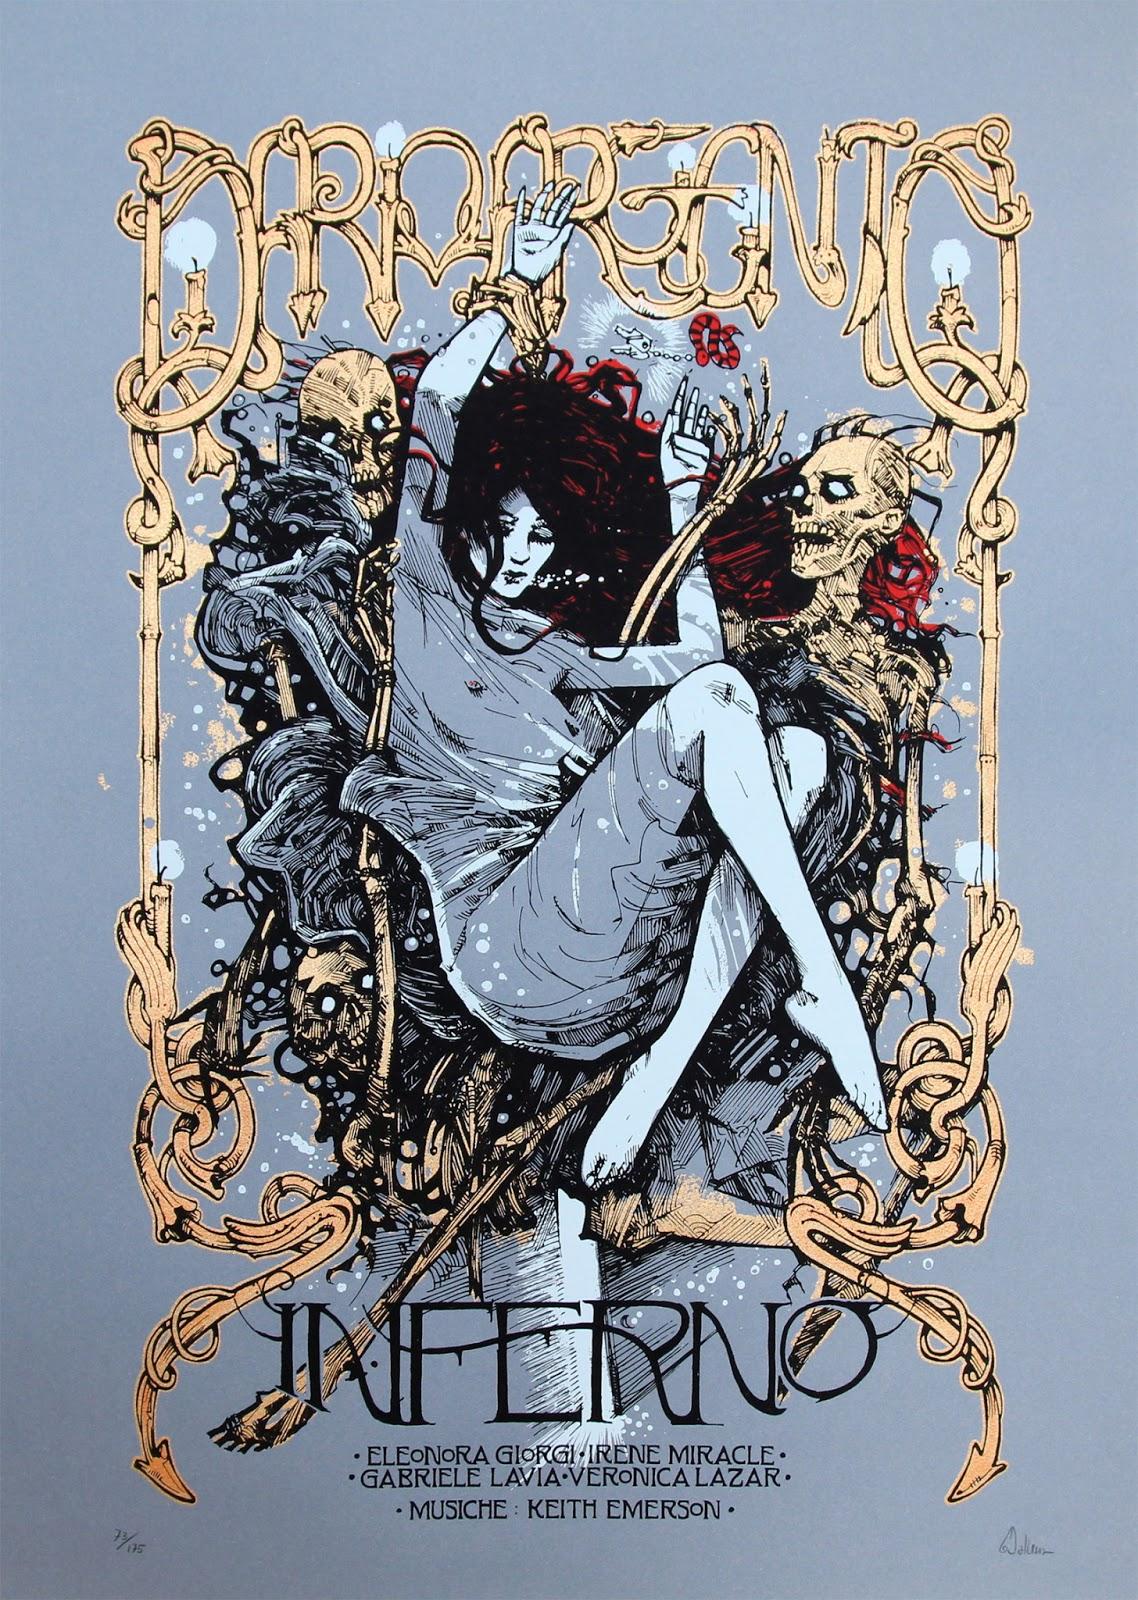 Inferno-Regular-Malleus-movie-inside-the-rock-poster-frame